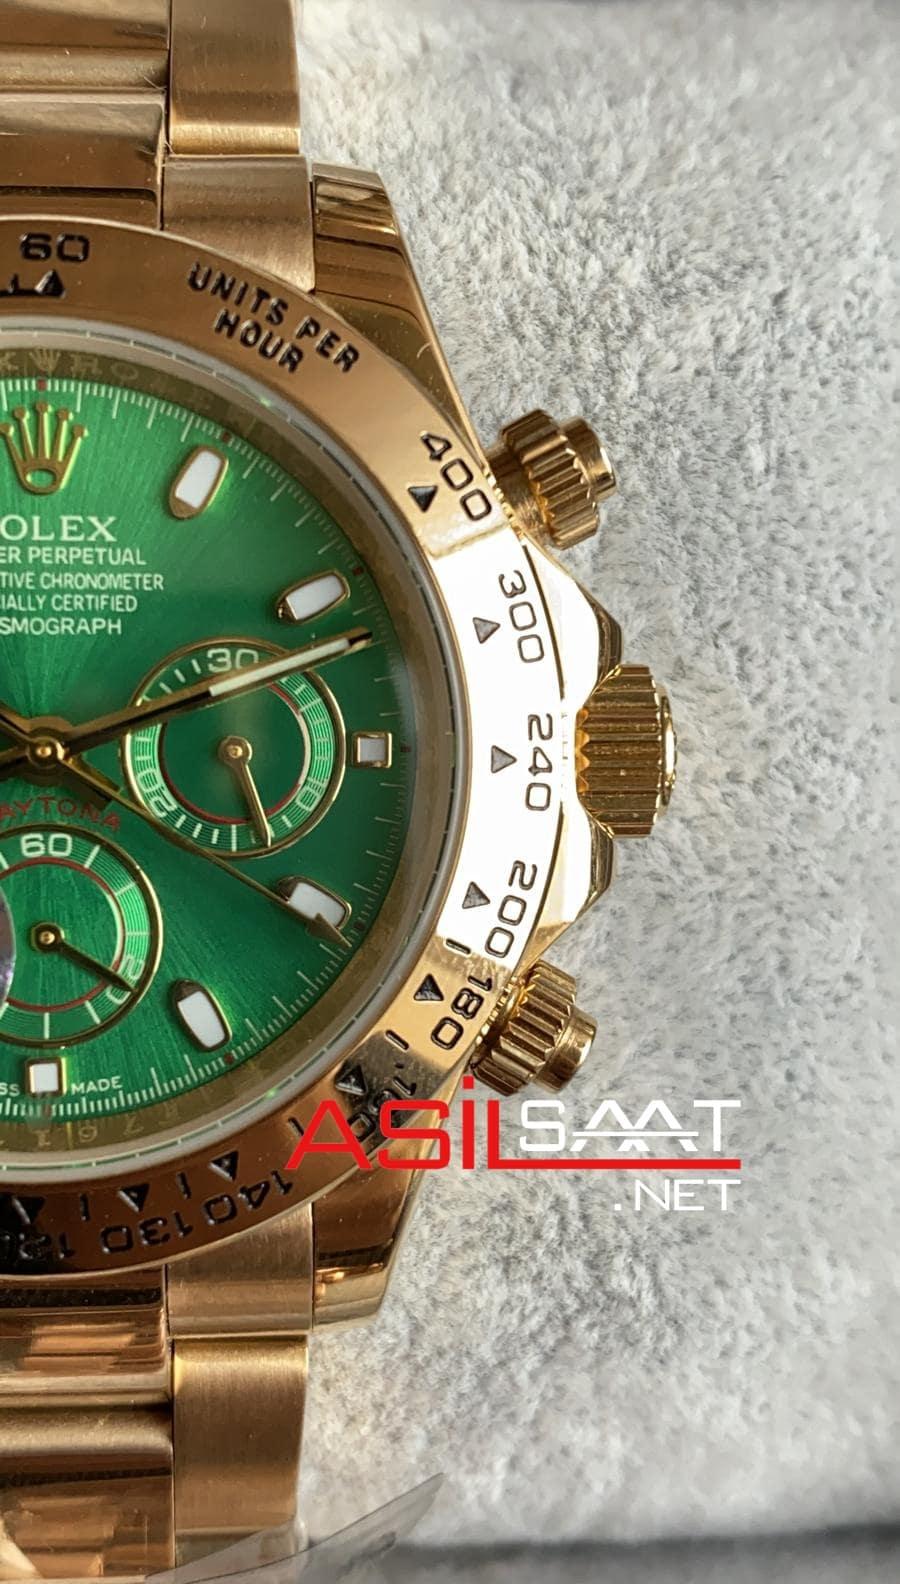 Rolex Oyster Perpetual Cosmograph Daytona Gold Replika Saat ROLDA021